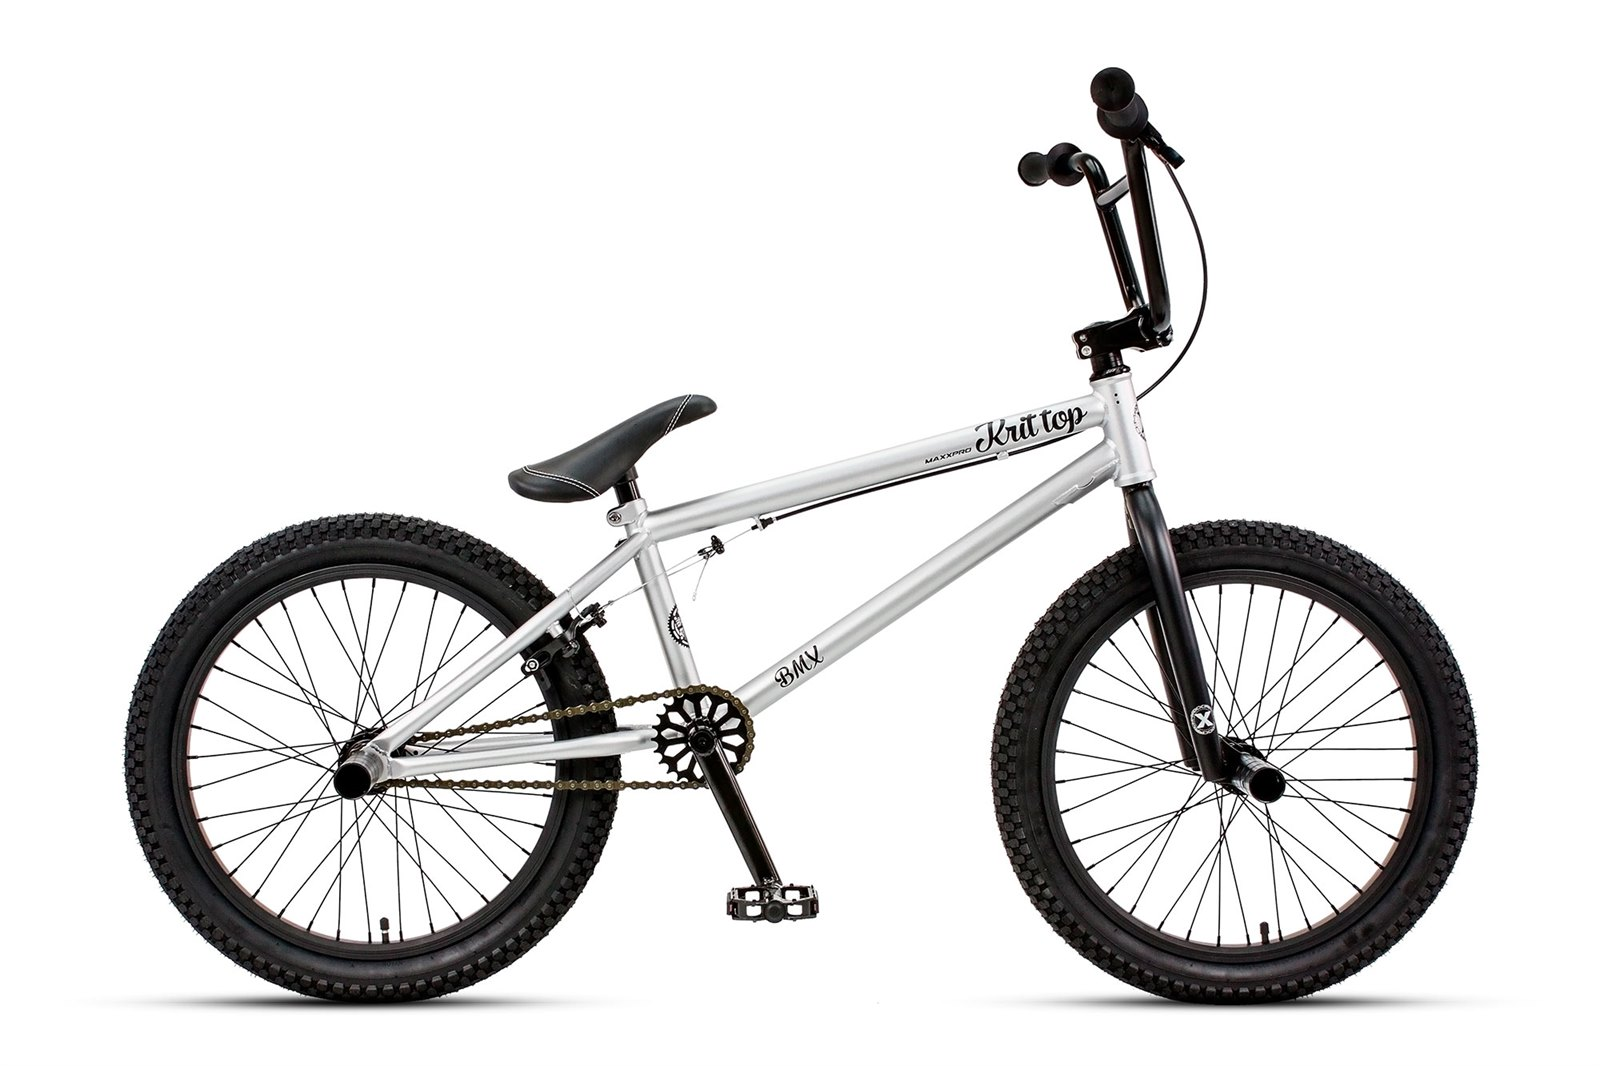 BMX велосипед MAXXPRO KRIT TOP